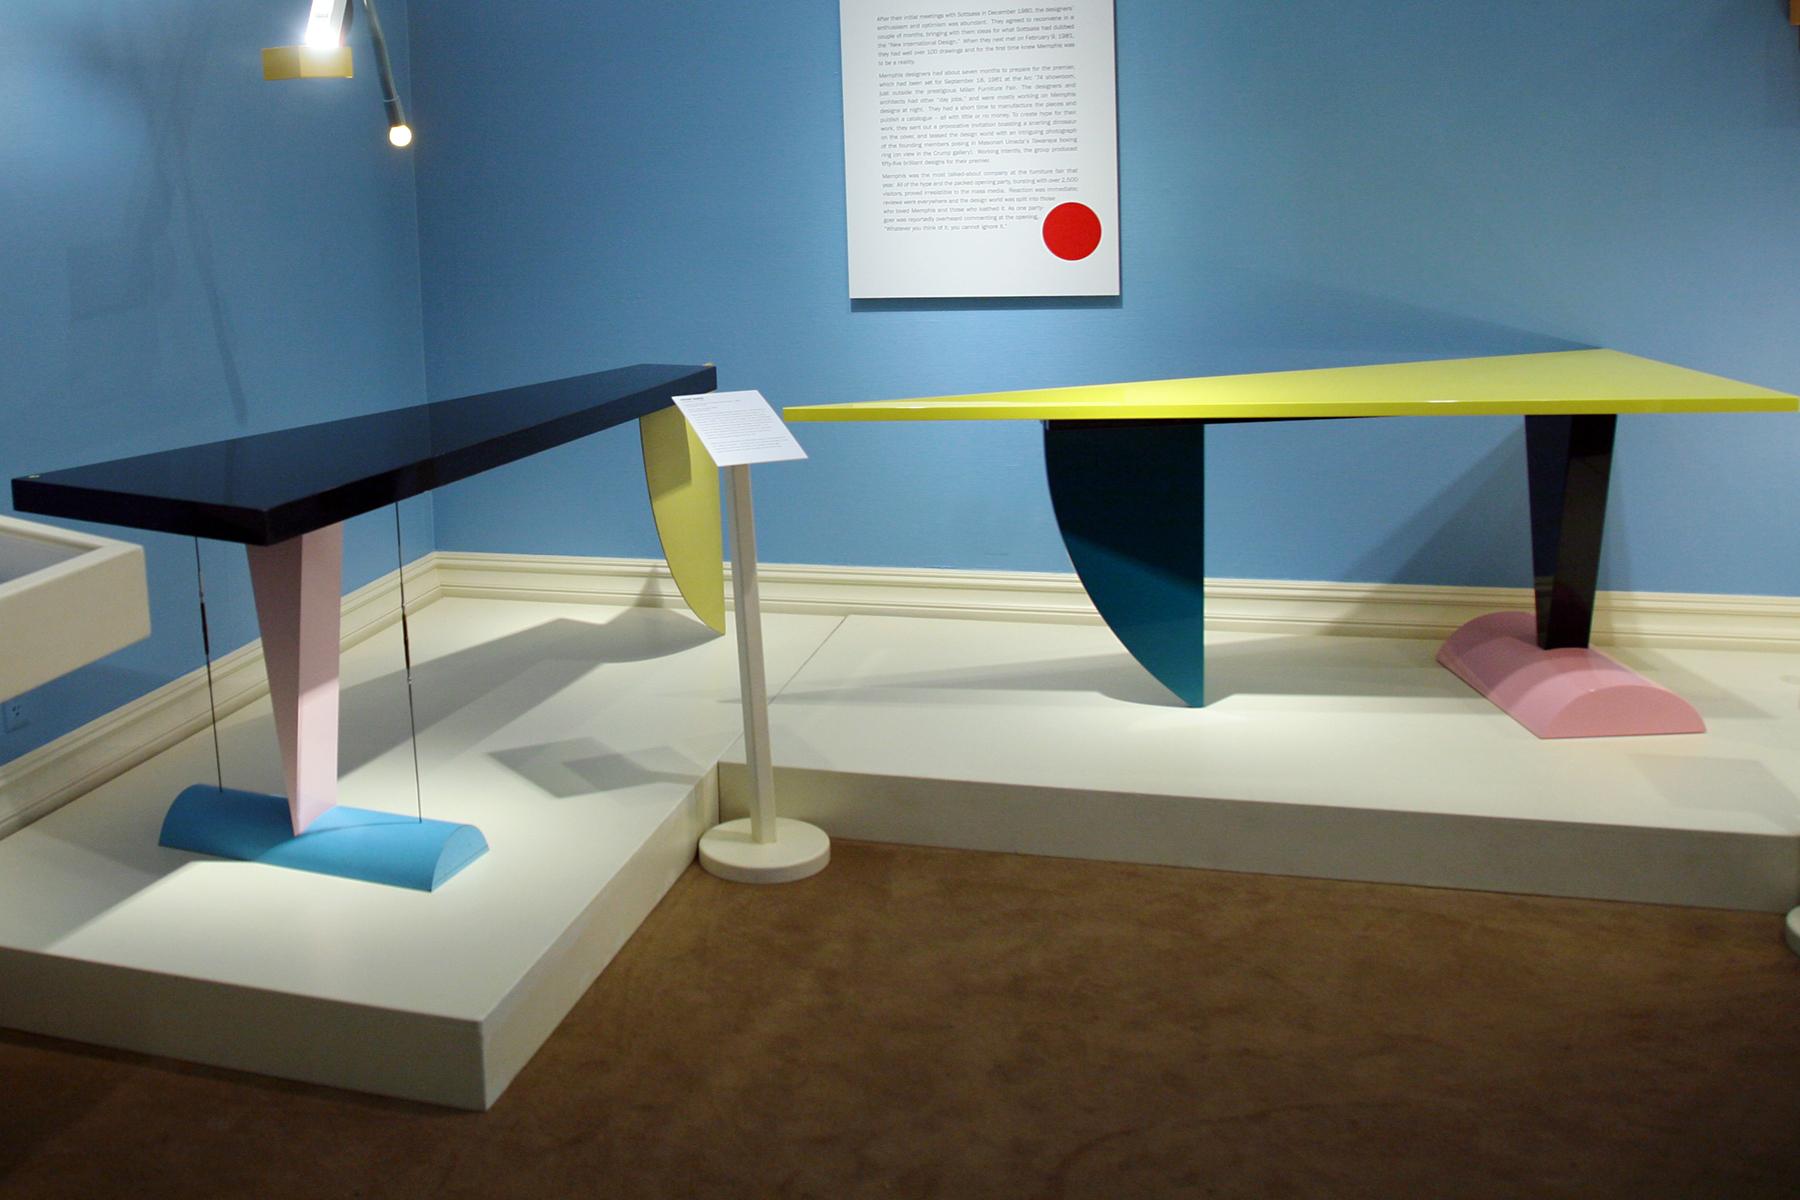 memphismilano 1980s italian design memphis group furniture